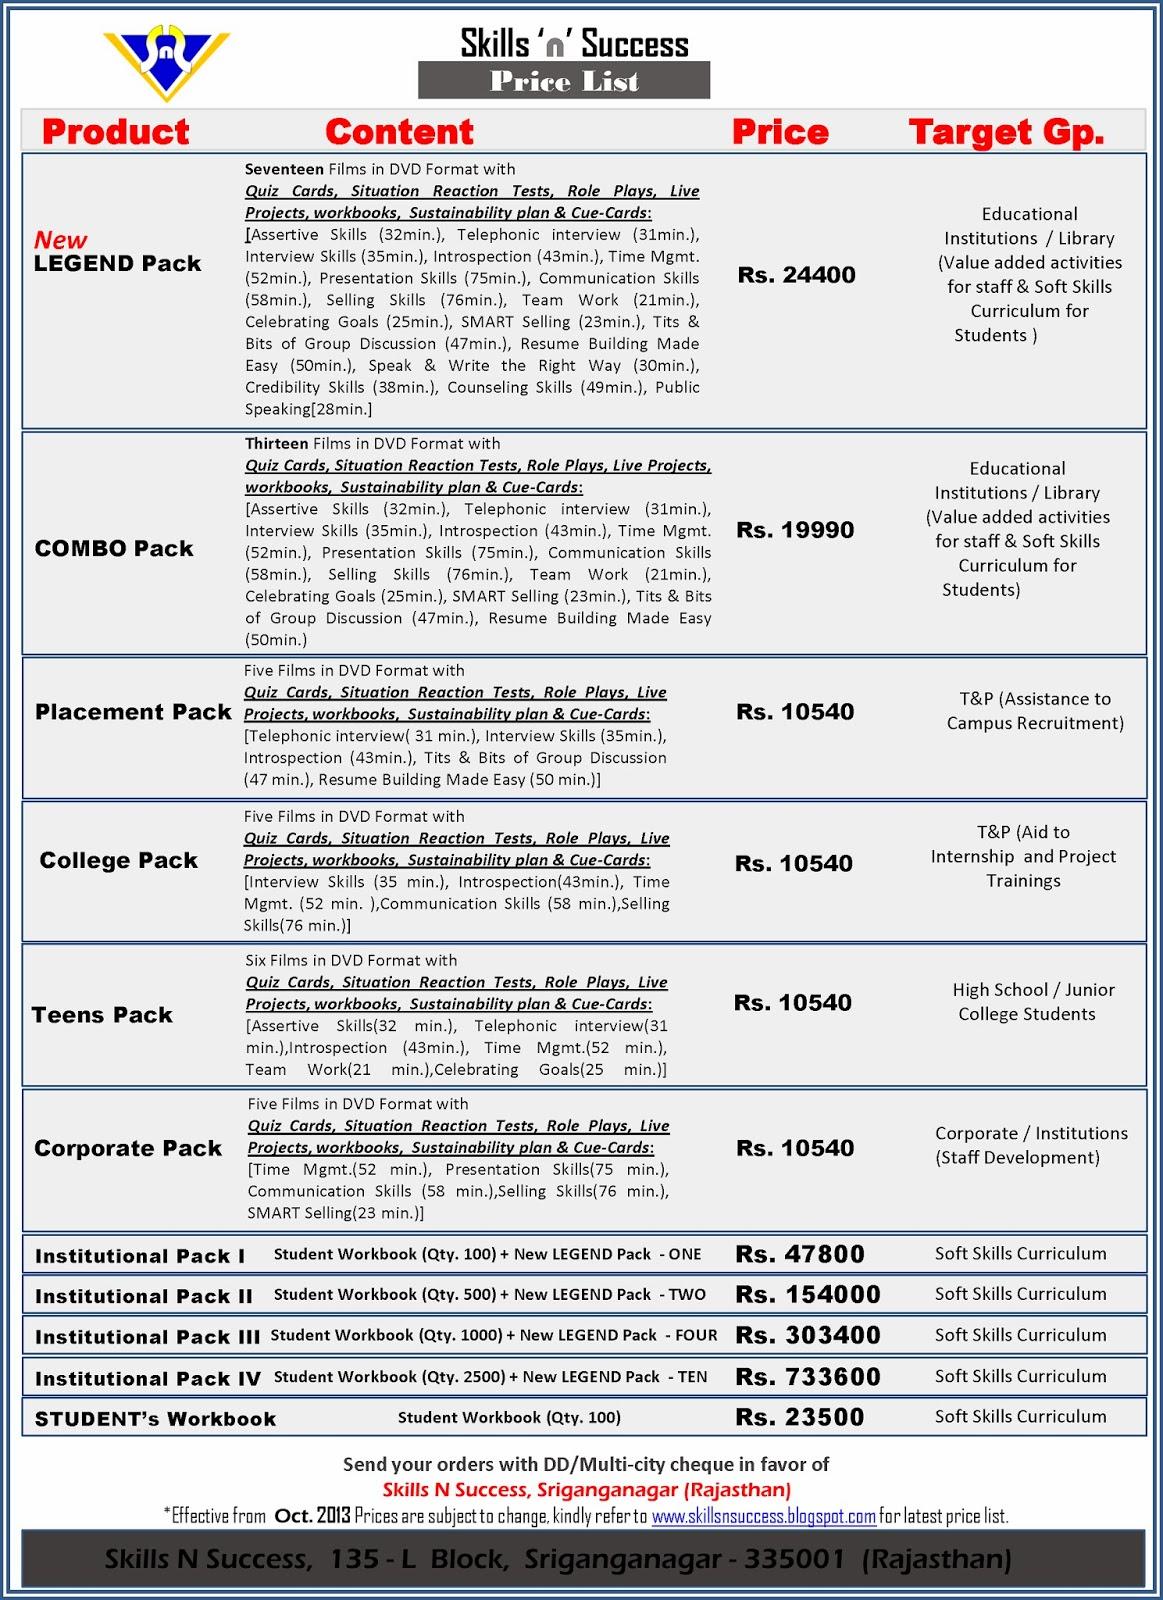 Soft Skills List For Resumes   List Of Skills To Put On A Resume